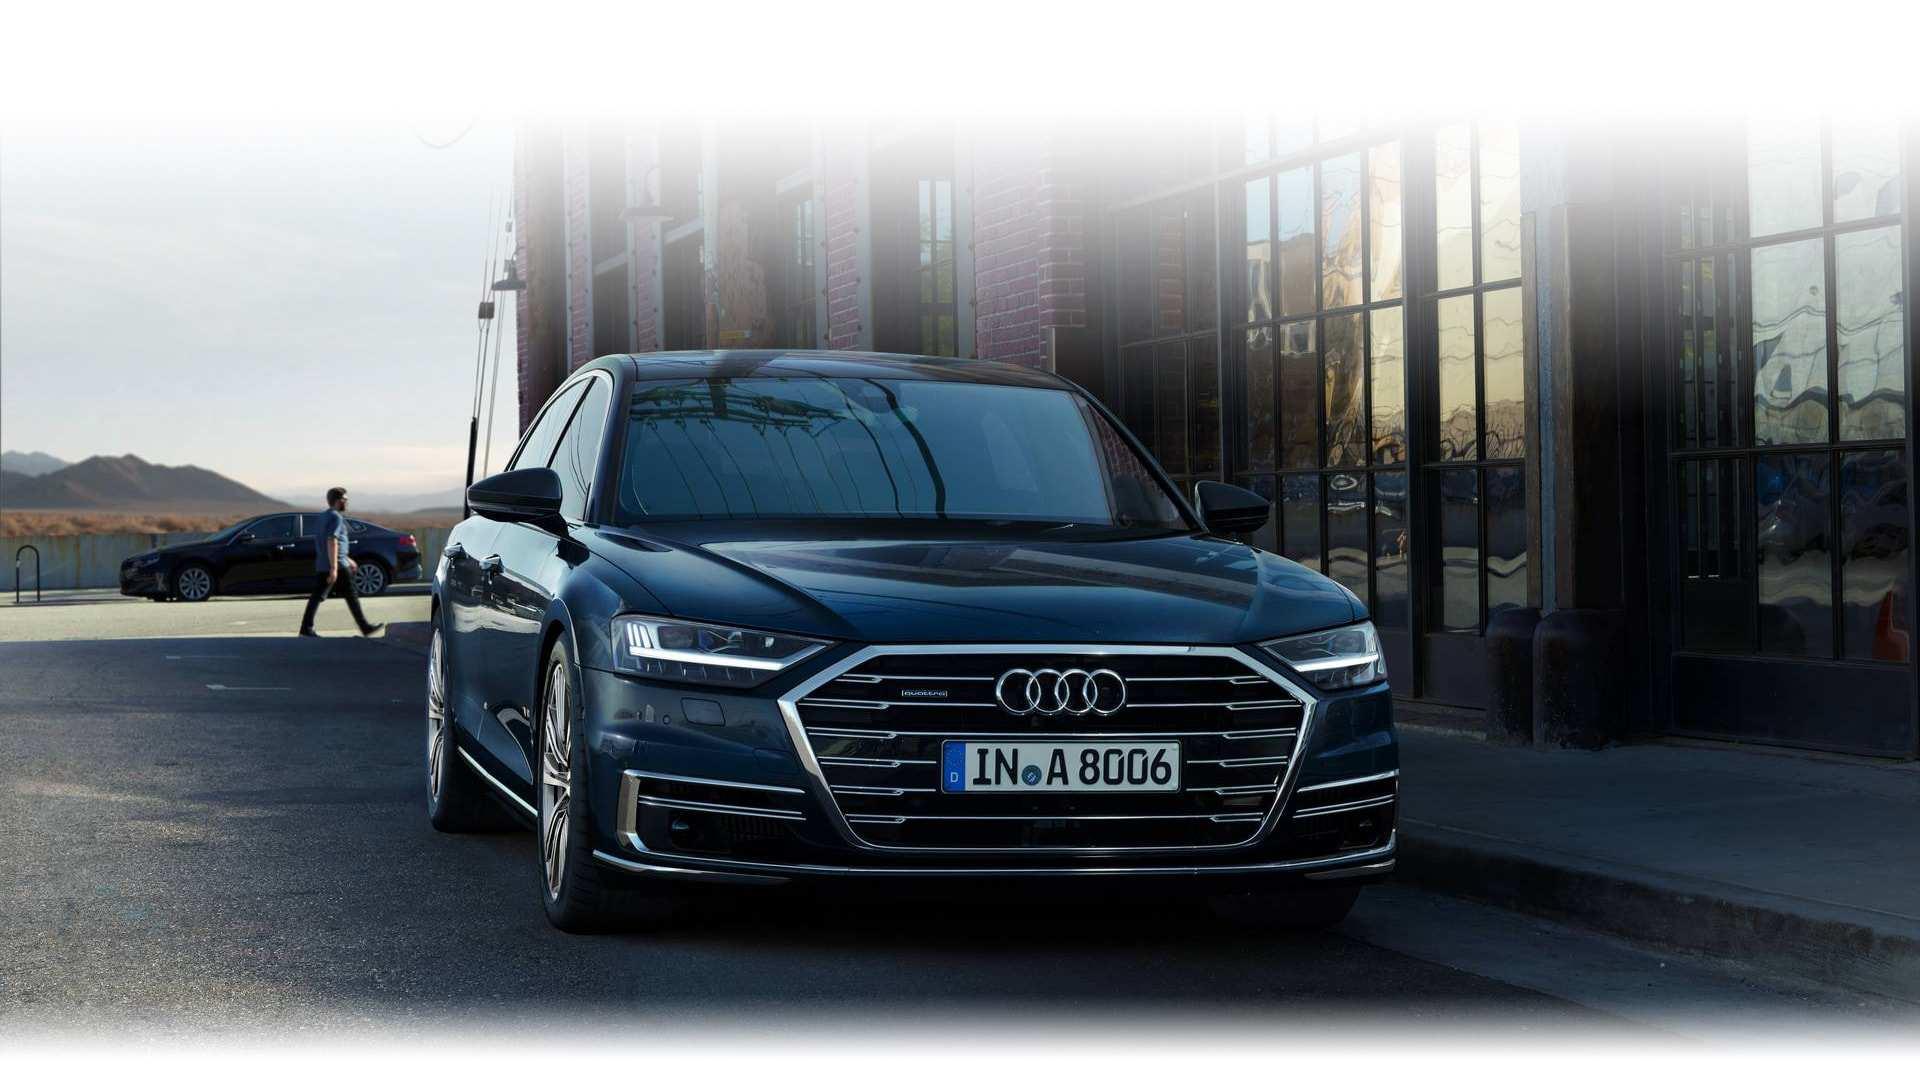 23 New 2019 Audi A8 Photos Interior with 2019 Audi A8 Photos